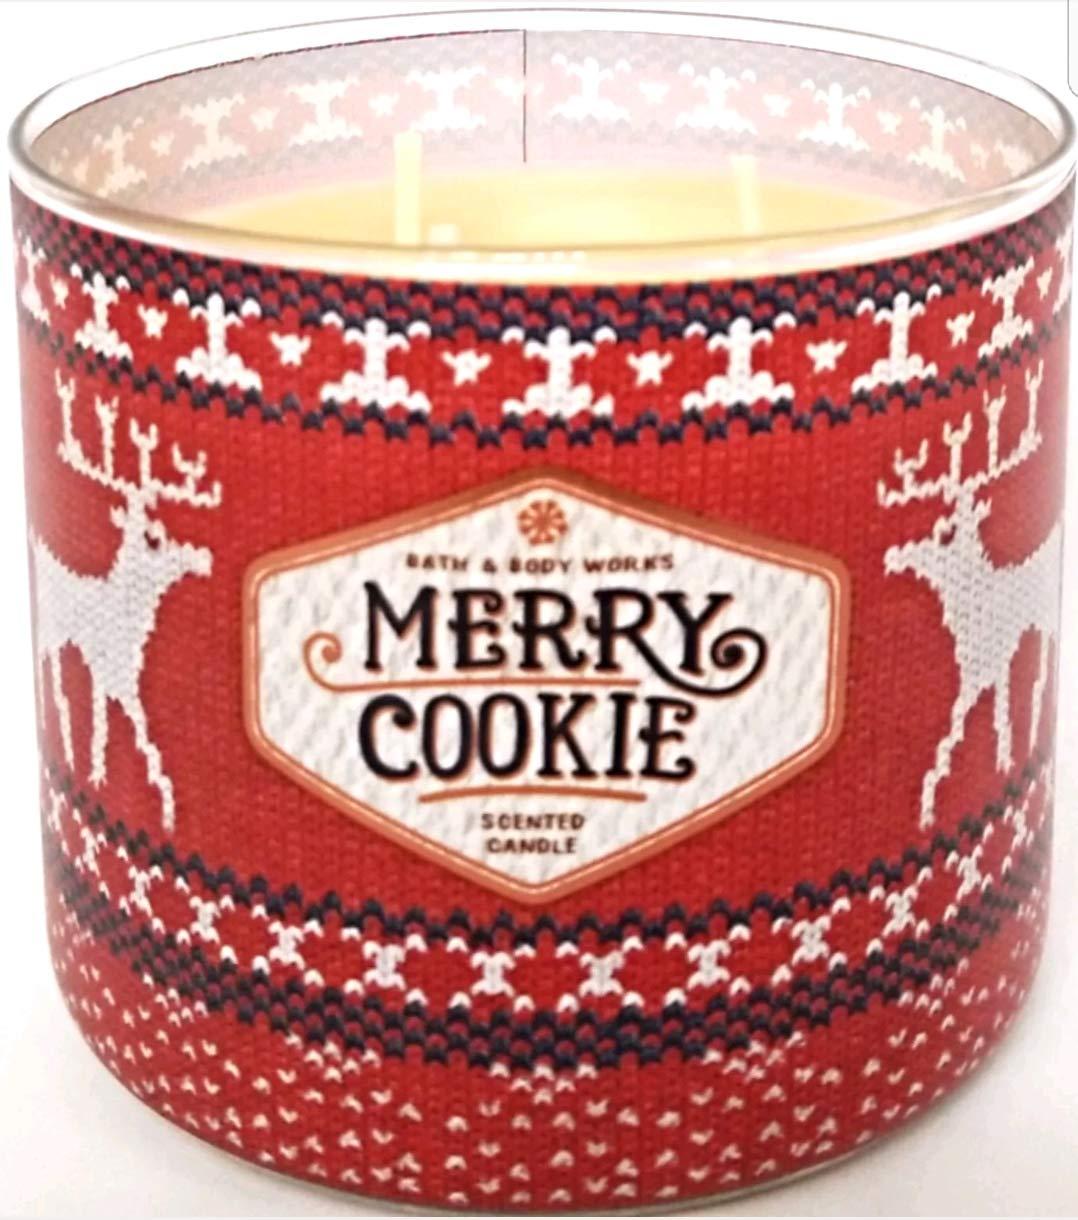 White Barn - White Barn Bath & Body Works 3 Wick Candle Merry Cookie